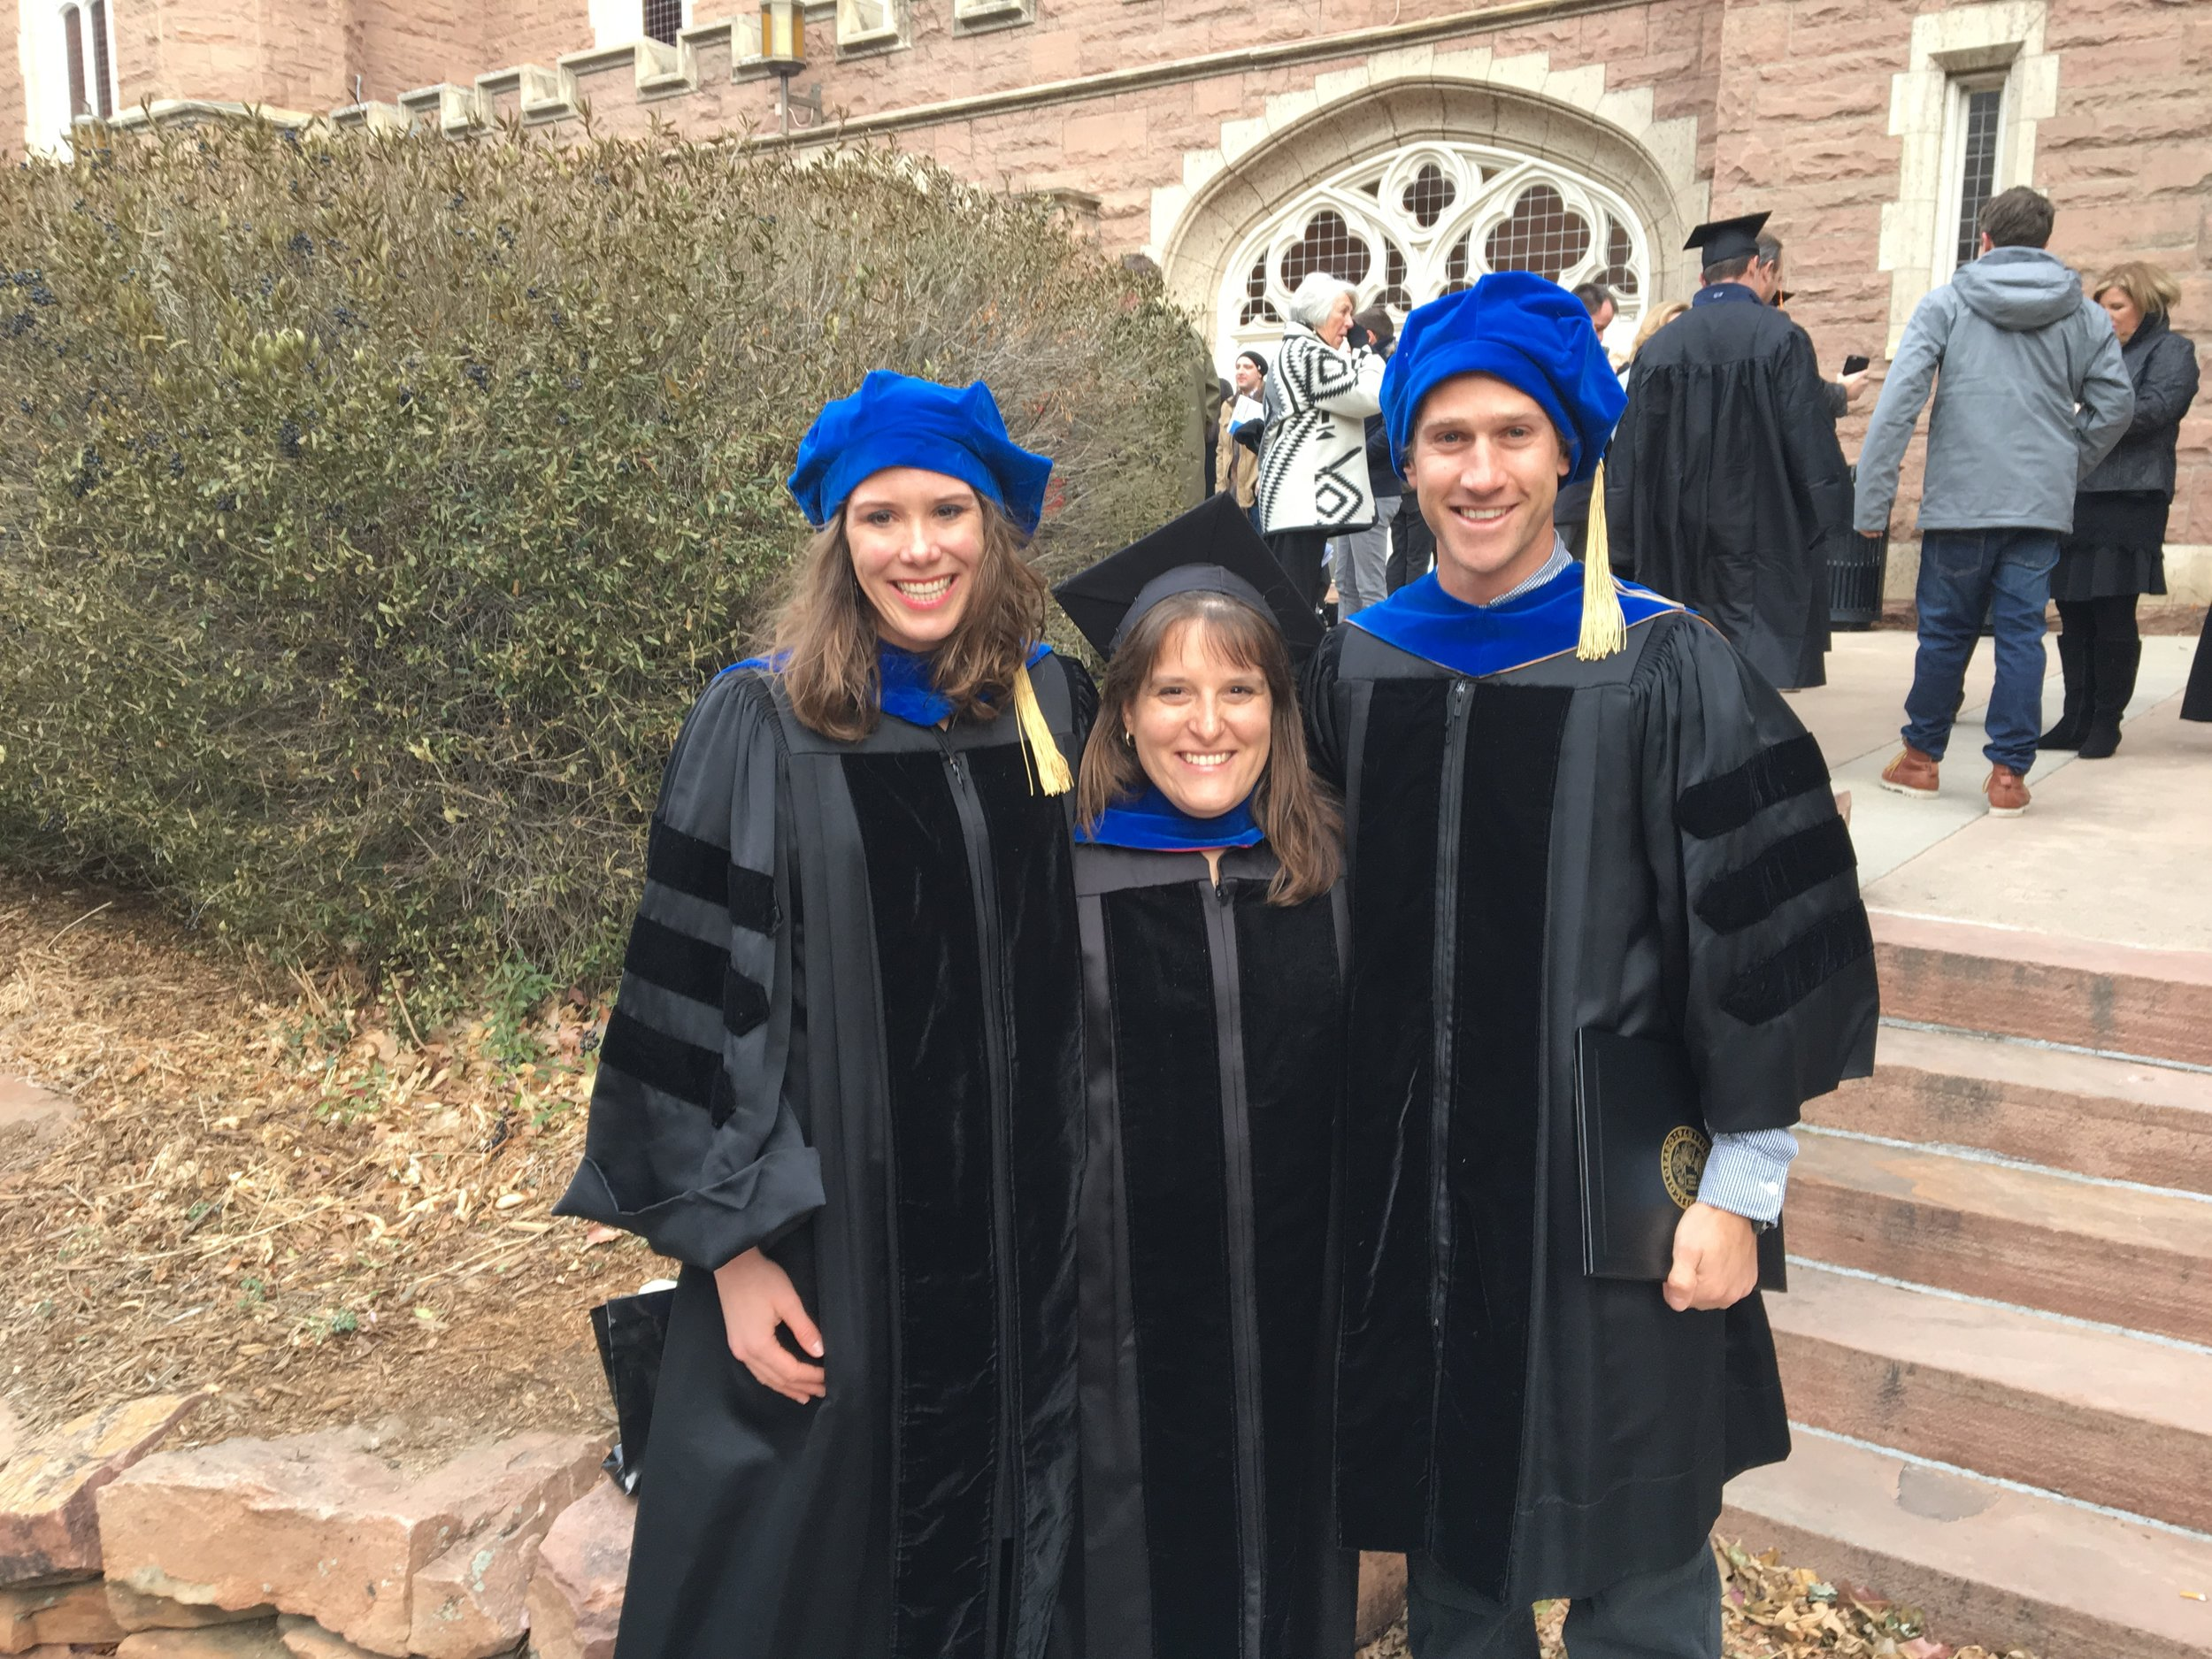 New Drs. Sarah Welsh-Huggins and Cody Harrington, with Abbie Liel